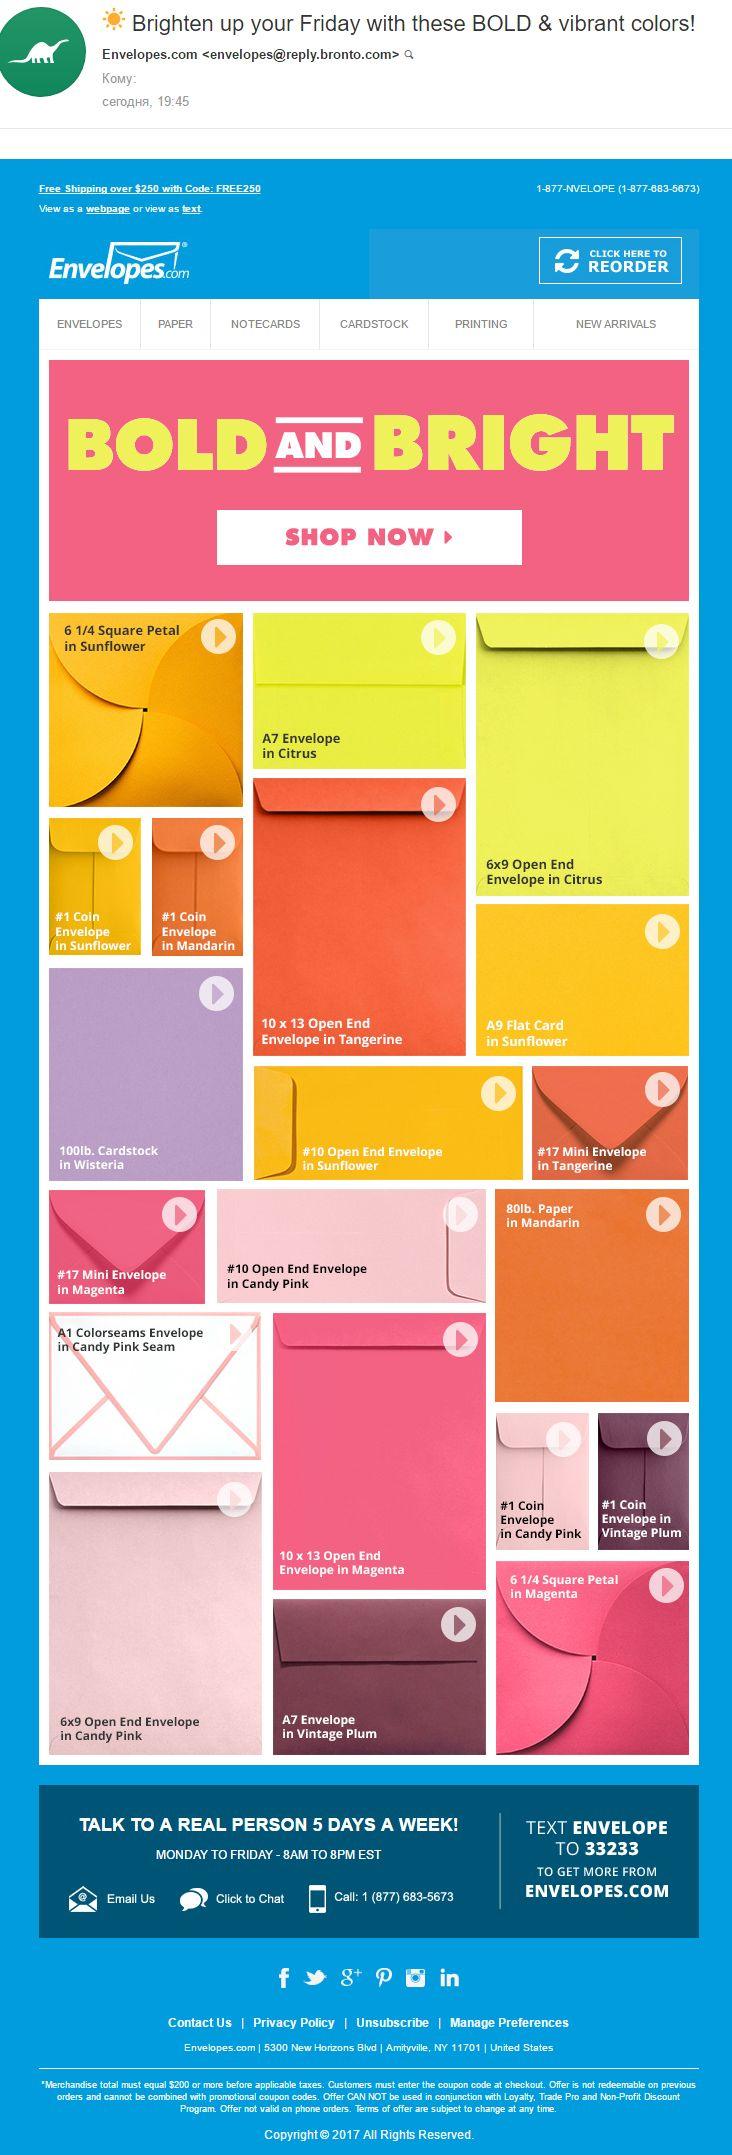 Envelopes.com (23.06.2017): All sizes of envelopes in one email simplify execution of the order. // Все размеры конвертов в одном письме упрощают оформление заказа. #EMAILMATRIX #emailmarketing #loyalty